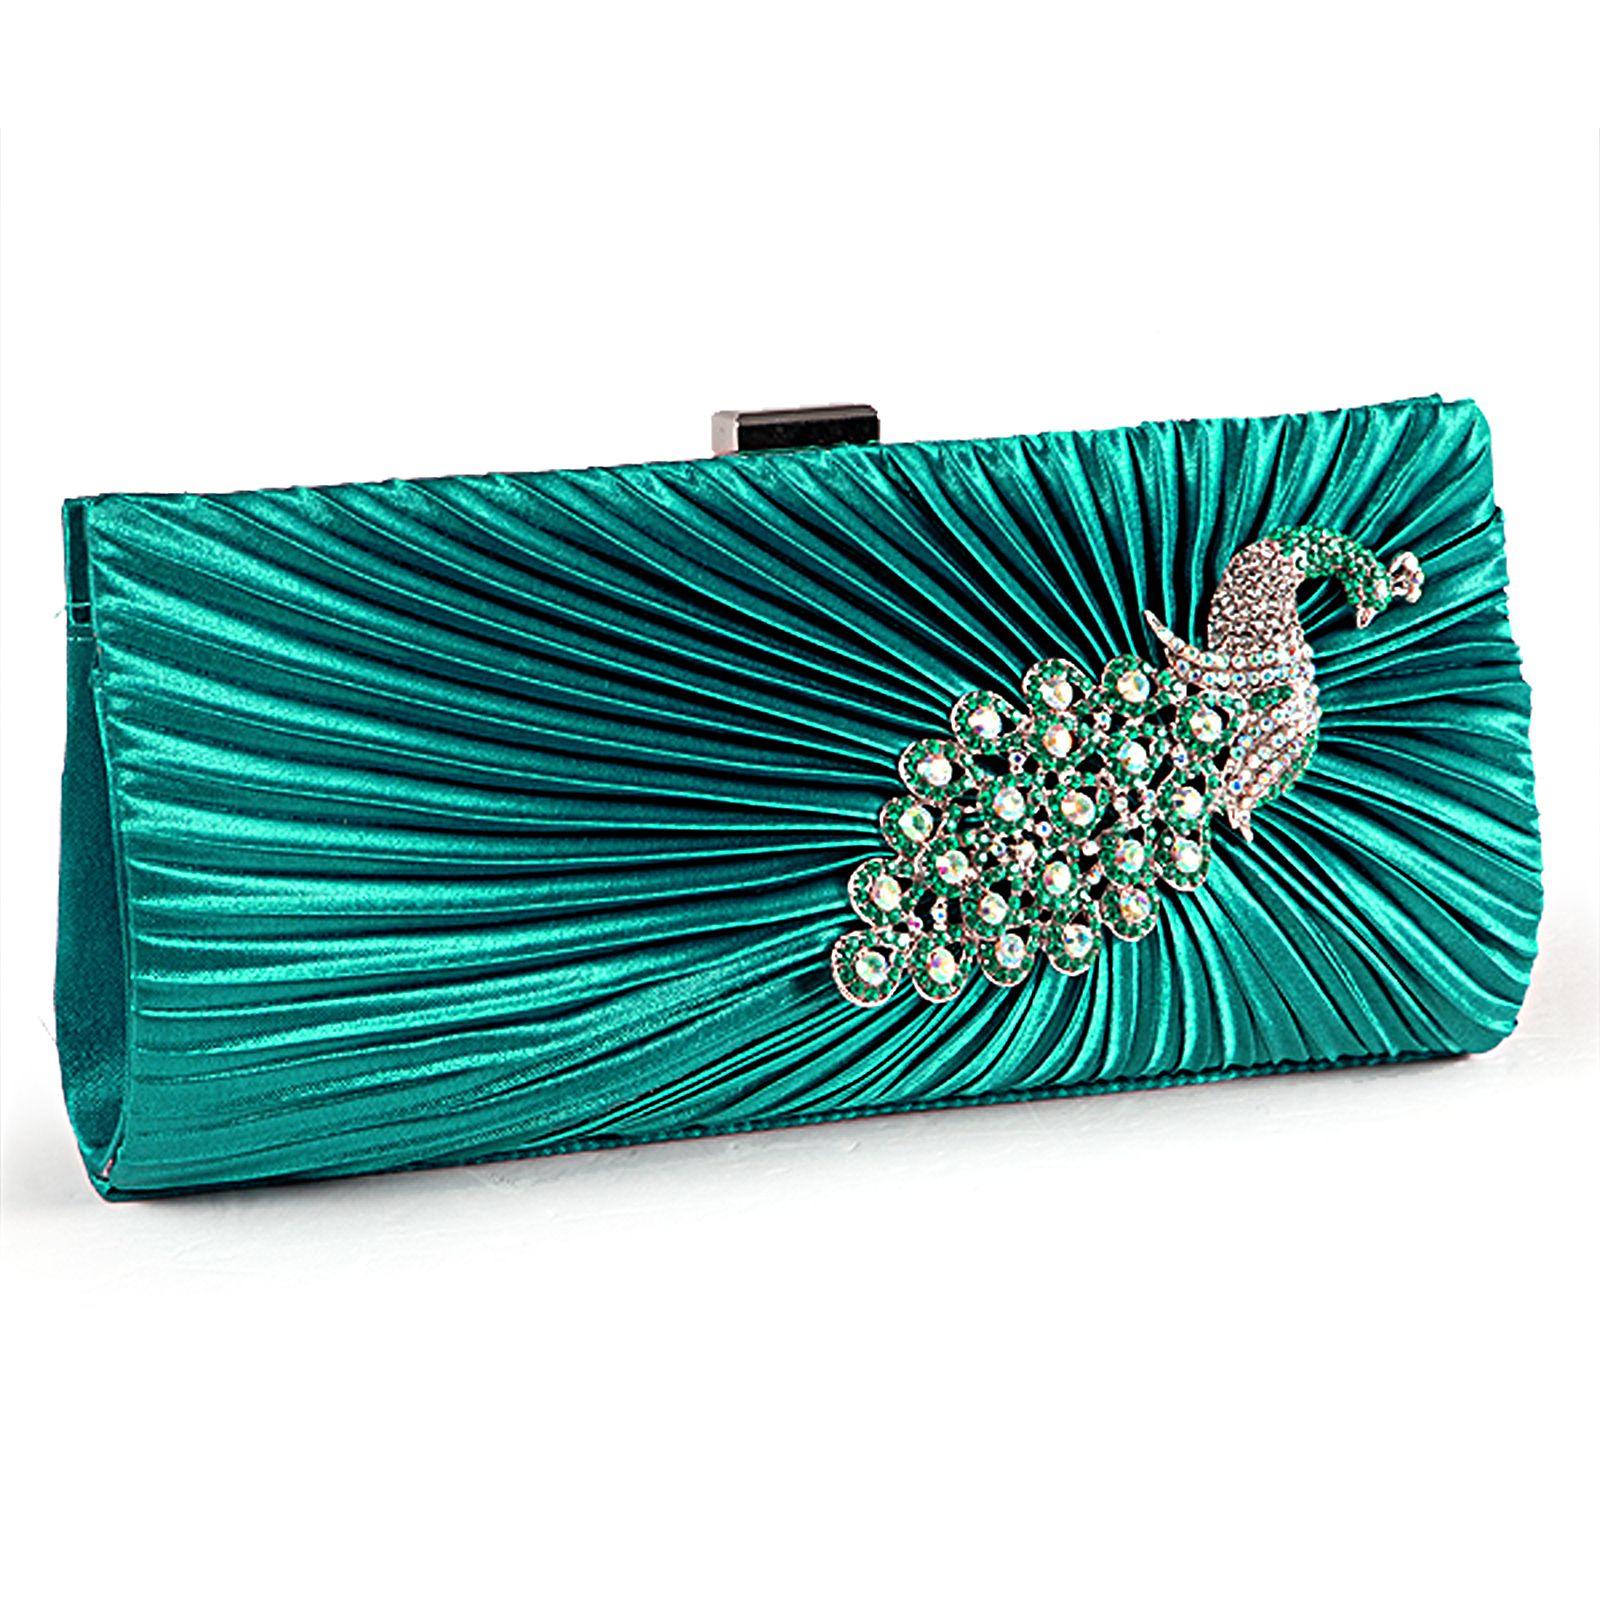 Ladies Satin Evening Clutch Bag Wedding Floral Crystal Women Handbag Pleated New